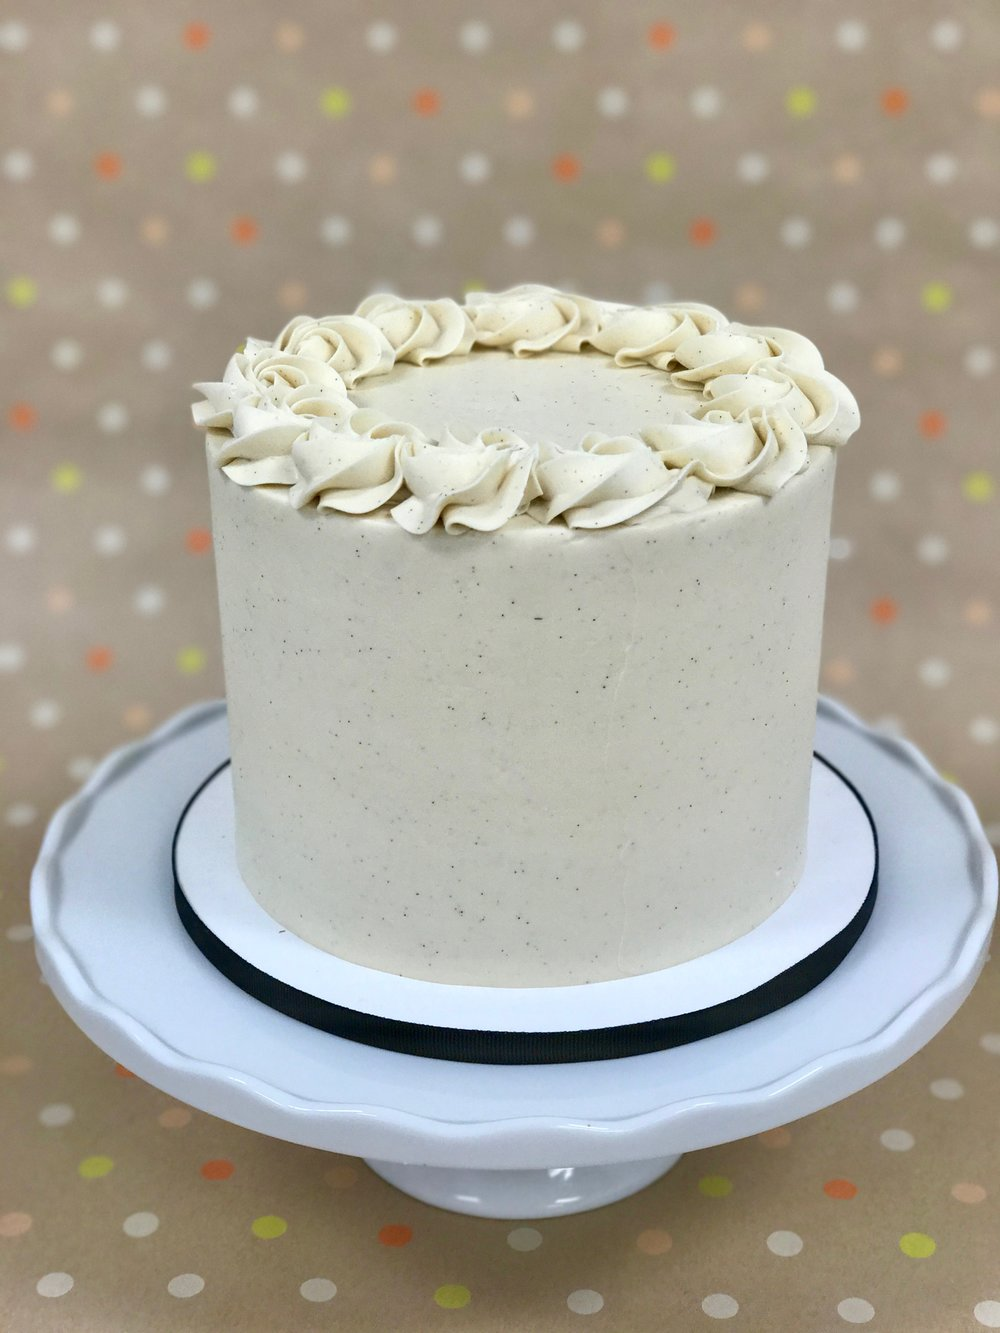 Vanilla Bean - Cake: Vanilla BeanFilling: Vanila Bean Swiss Meringue ButtercreamFrosting: Vanilla Bean Swiss Meringue Buttercream